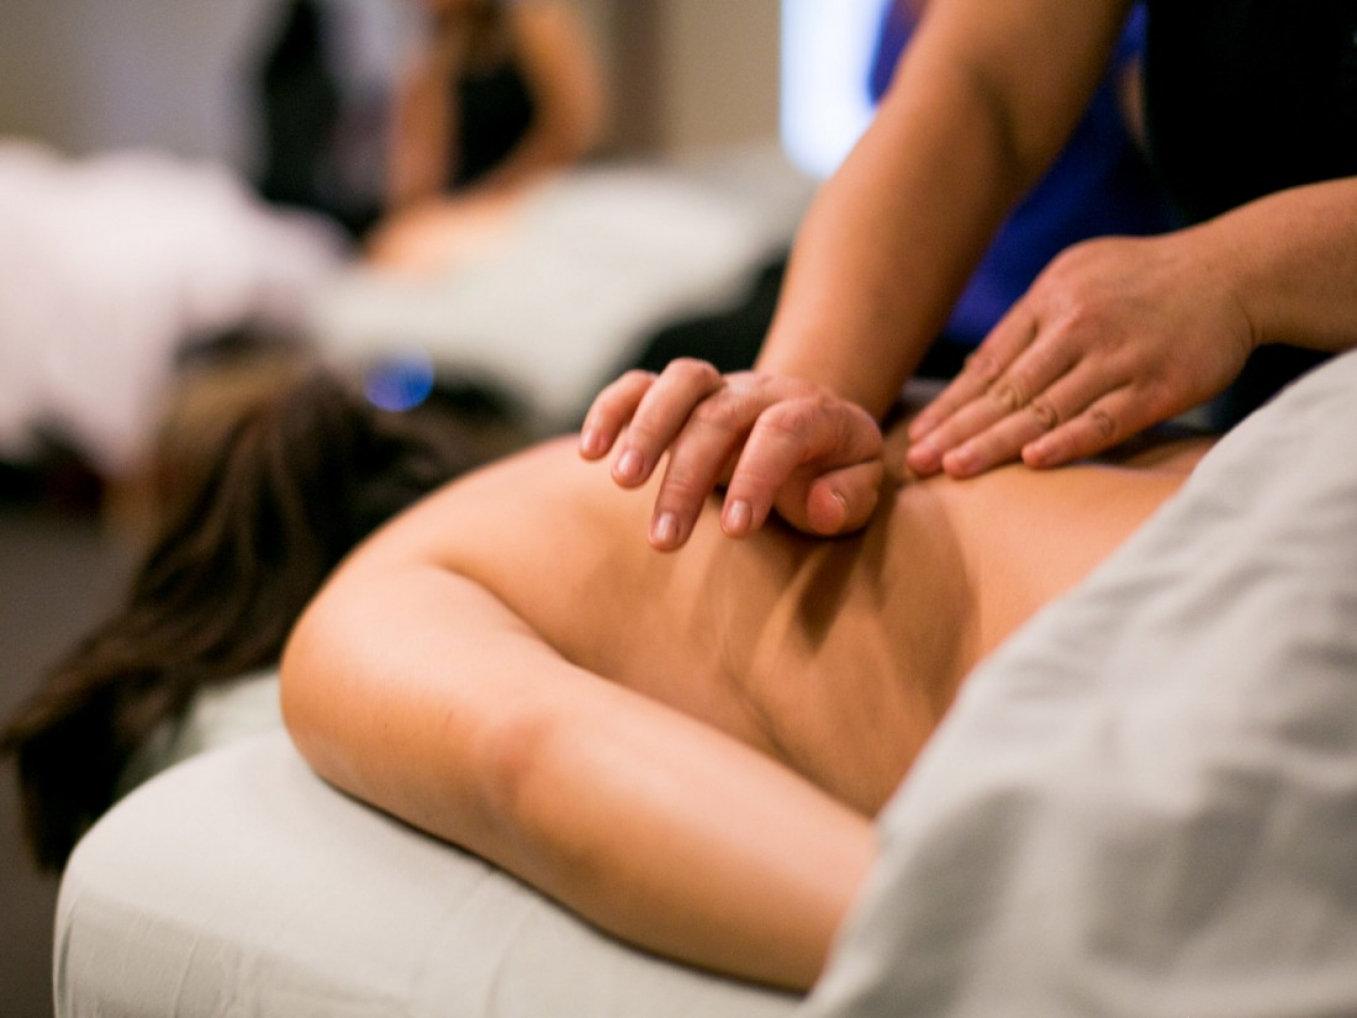 Full Body Relax Massage - £35